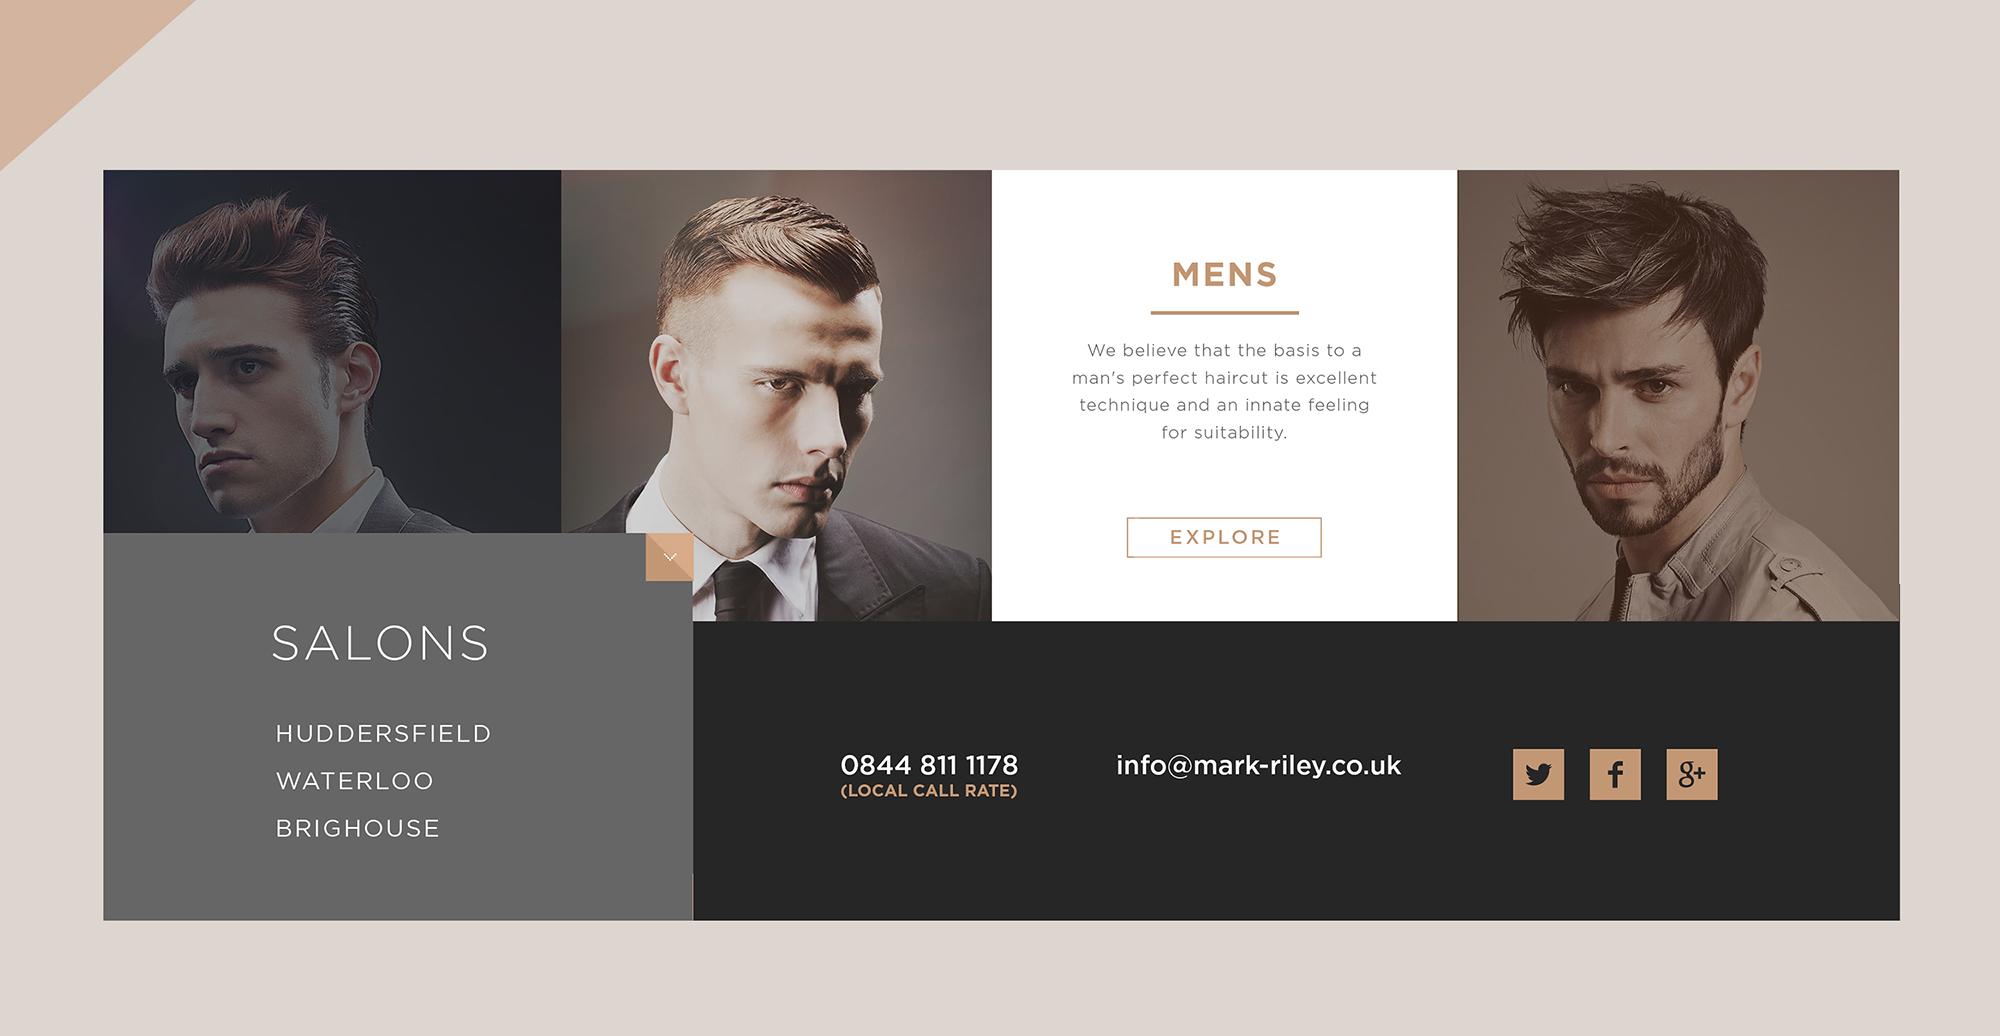 Mark_Riley_website_redesign_05